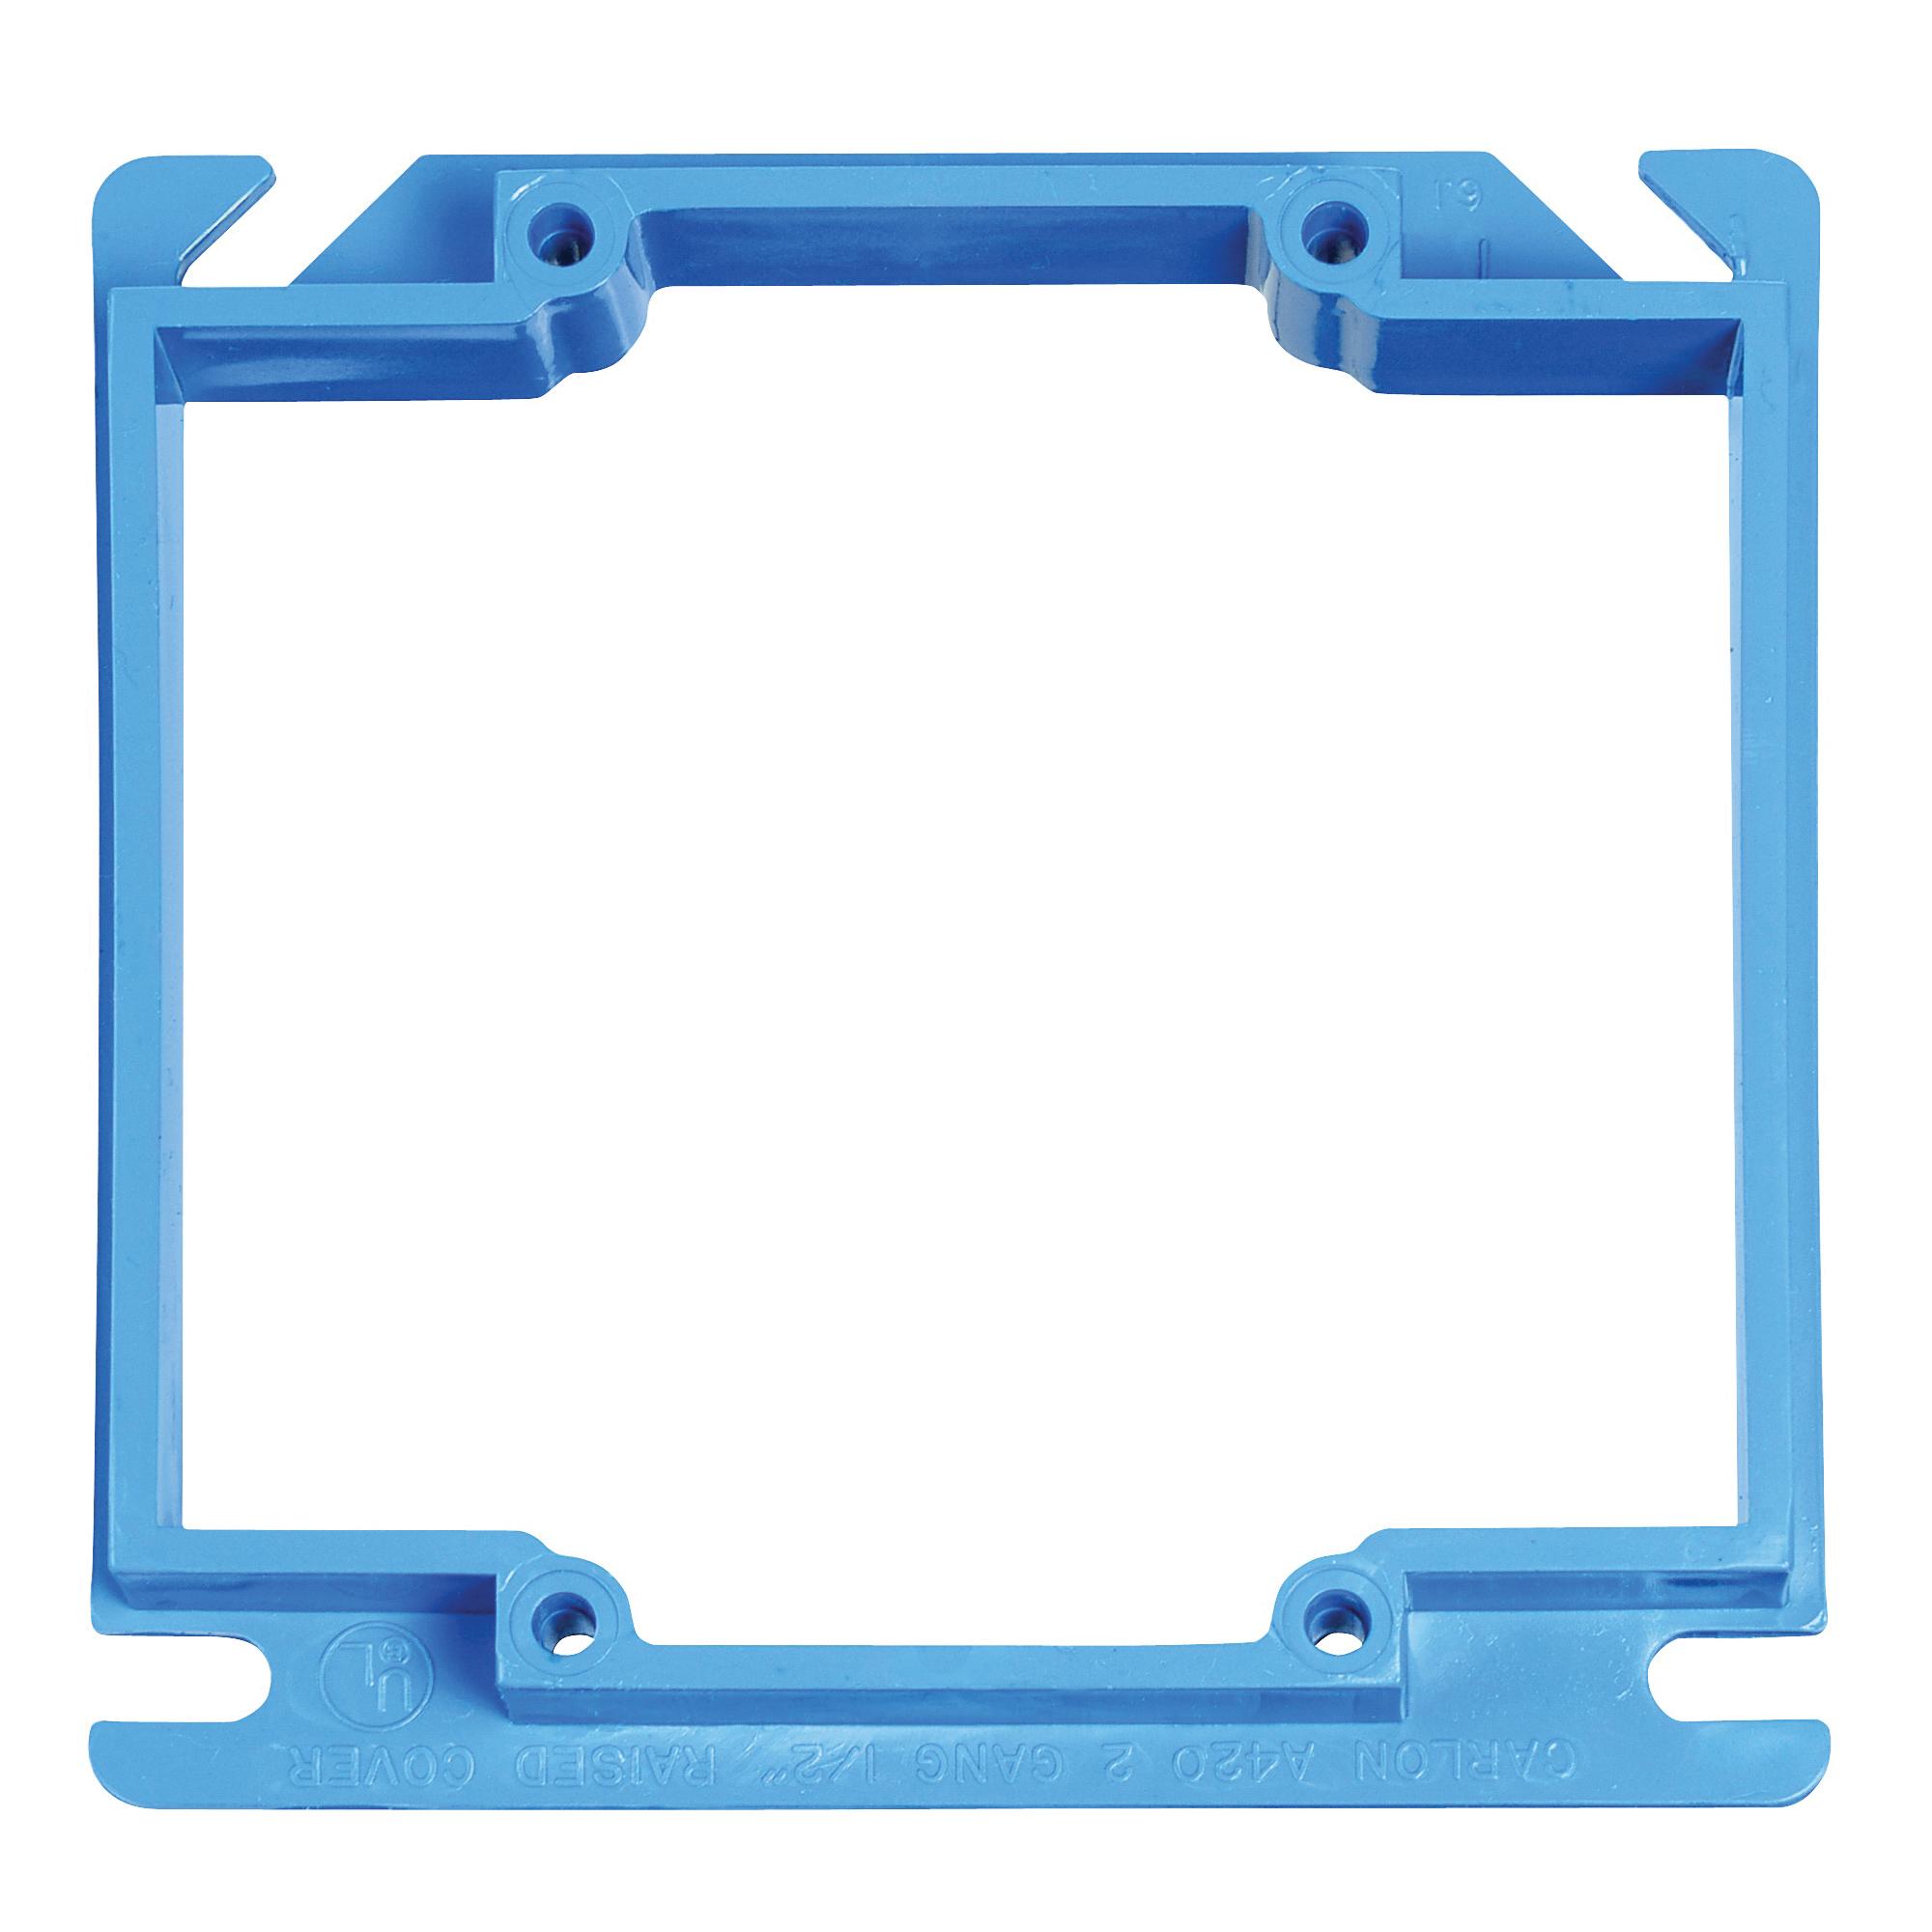 Picture of Carlon A420RR Electrical Box Cover, 4 in L, 4 in W, Square, PVC, Blue